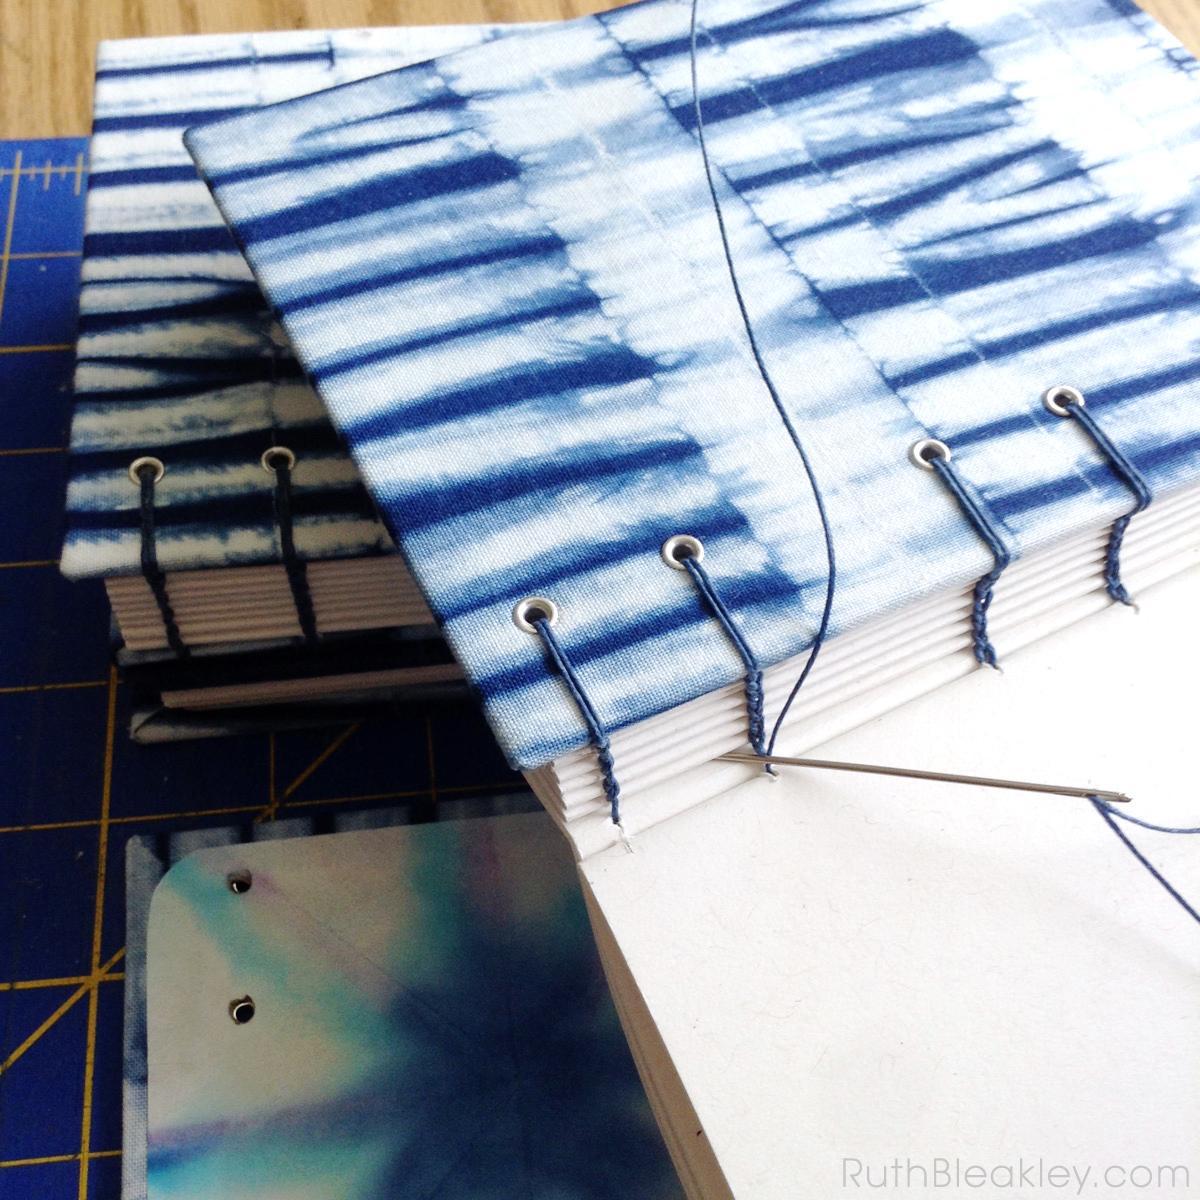 Shibori Handmade Journals in Progress by bookbinder Ruth Bleakley - 5